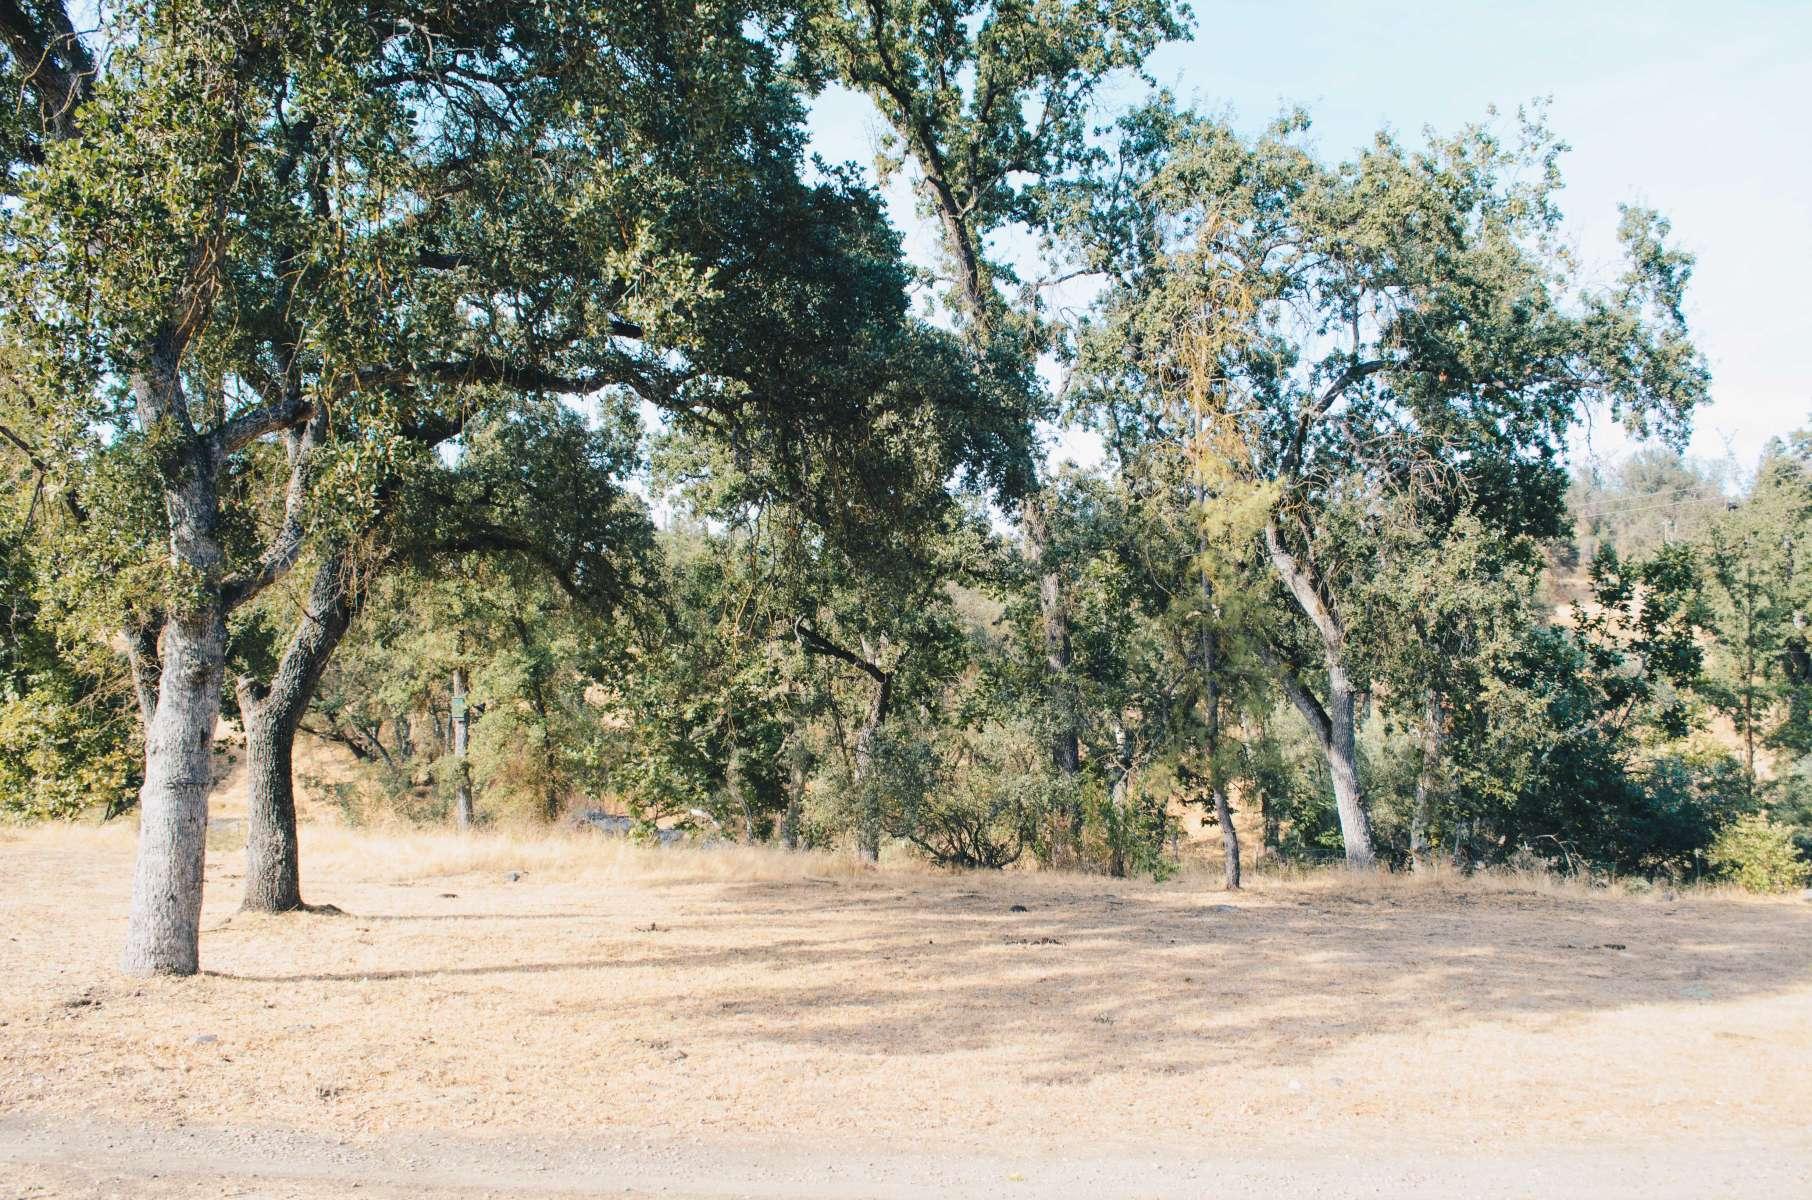 Rustic retreat group campsite serenity rustic retreat ca for Rustic retreat